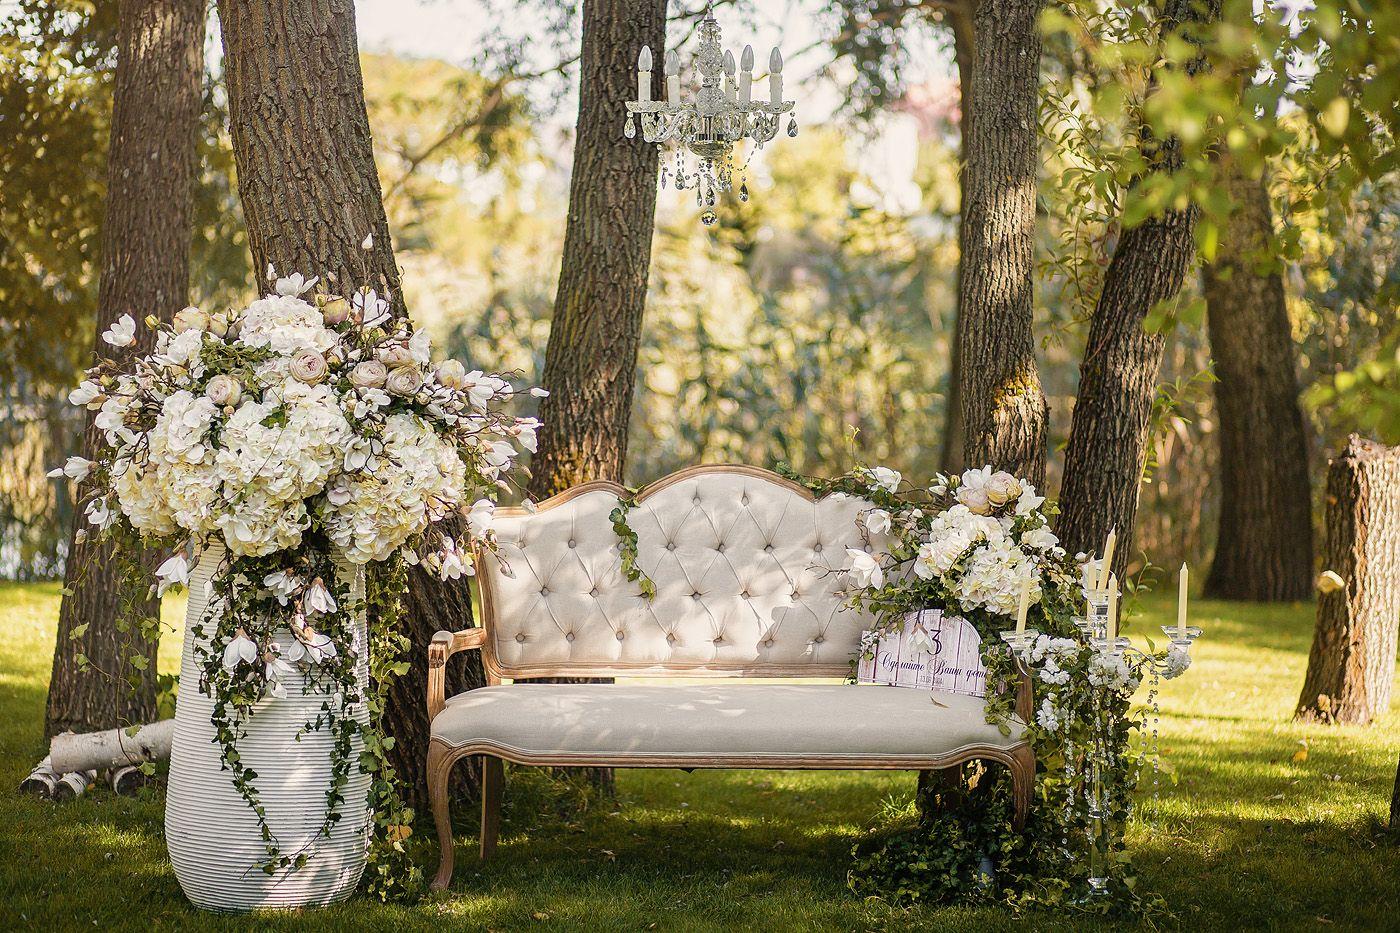 wedding, wedding ceremony, wedding decor, wedding photo zone, свадьба, церемония, фотозона